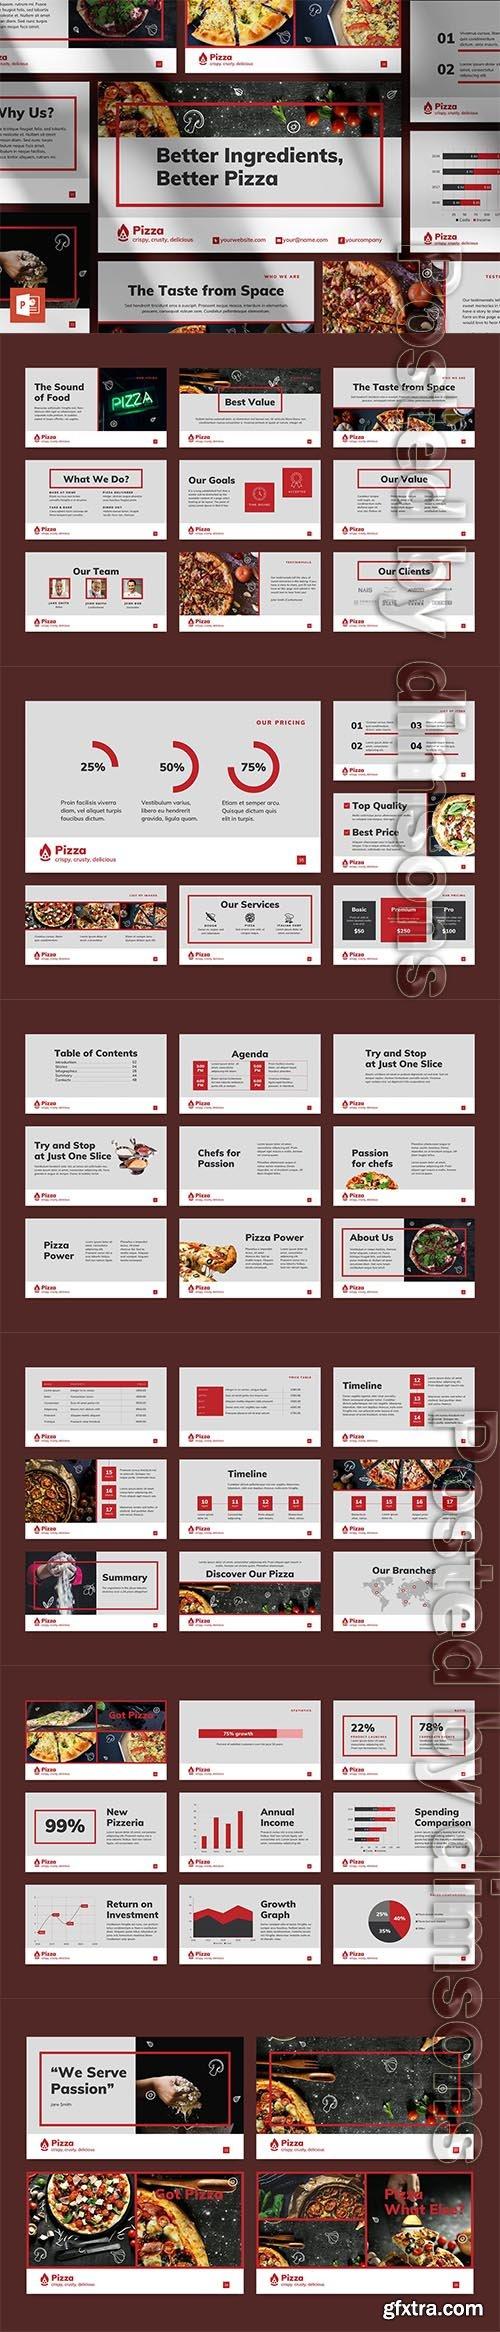 Pizza Restaurant PowerPoint Presentation Template